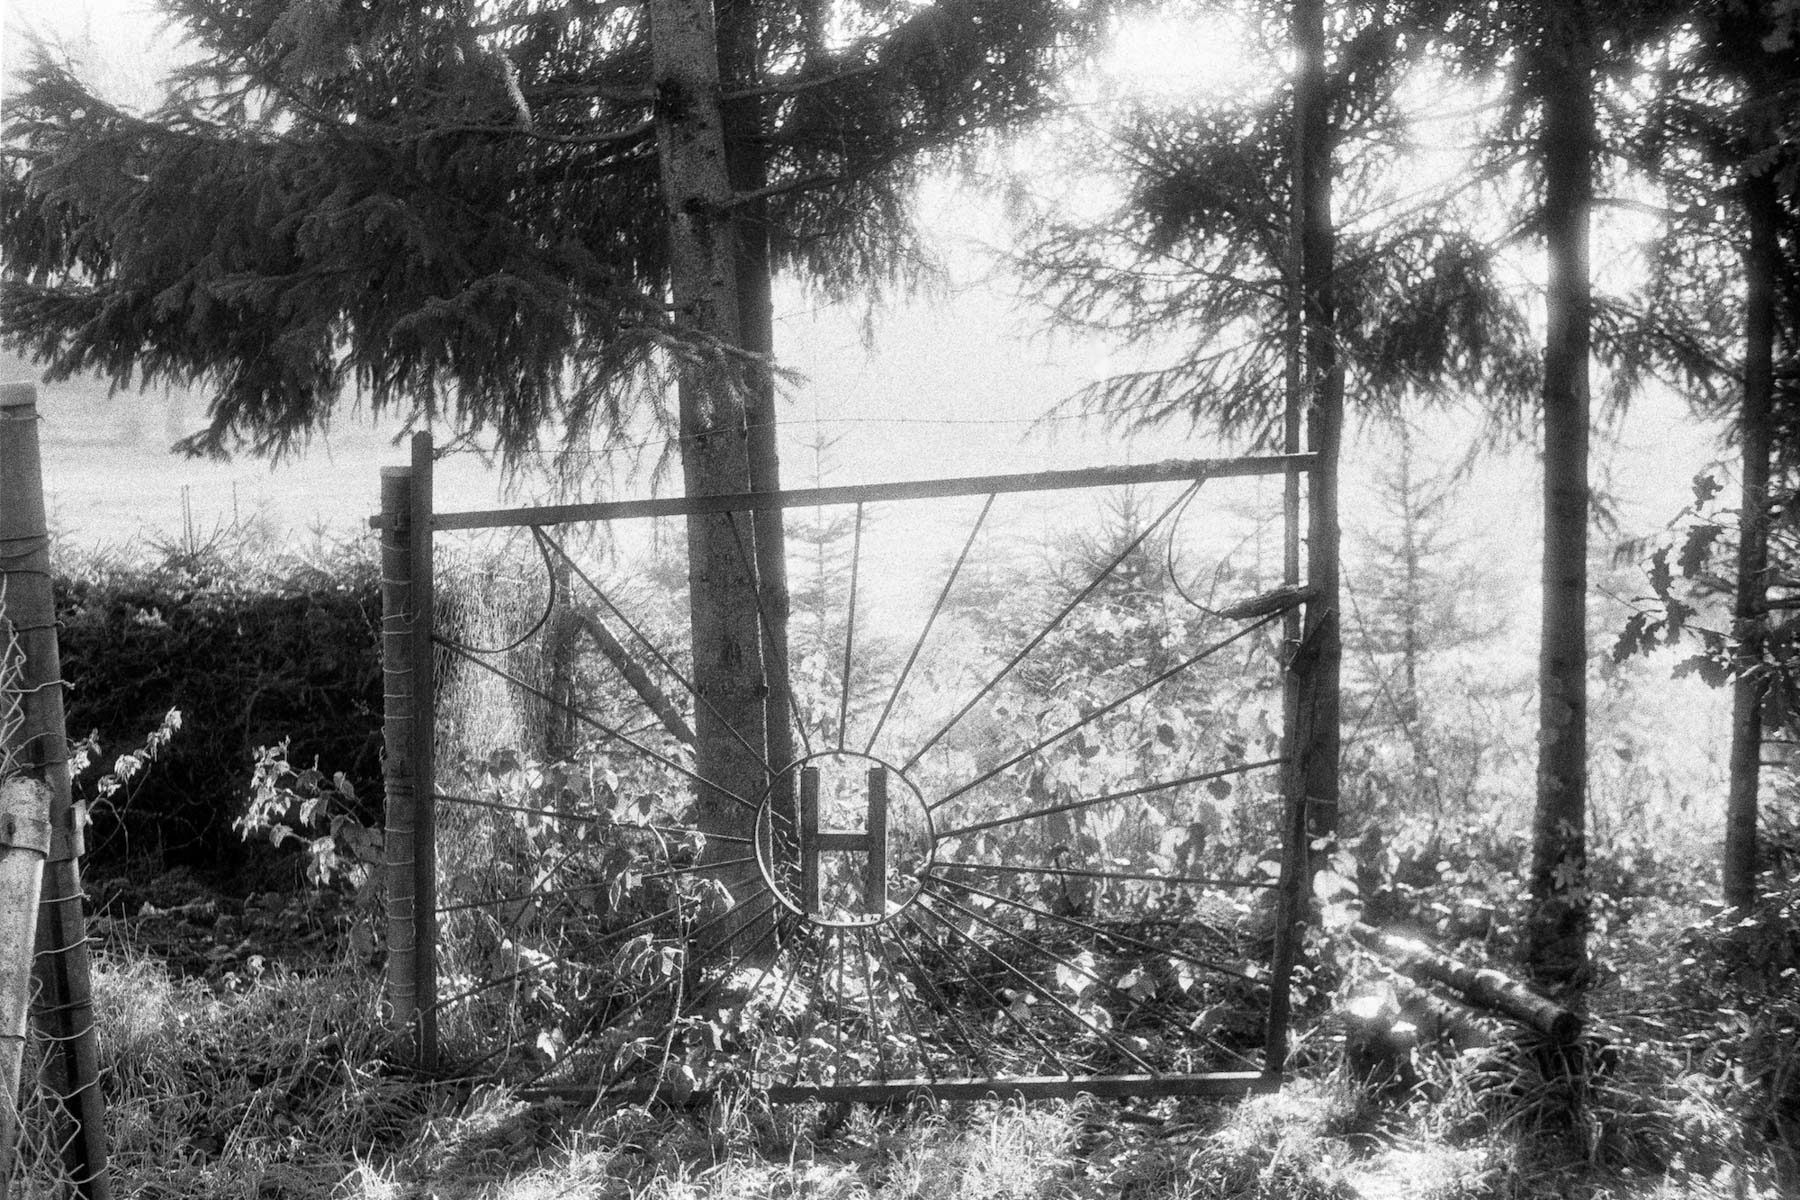 5 Frames With... Film Washi F (EI 100 / 35mm format / Rollei 35TE) - by Olaf Lengler